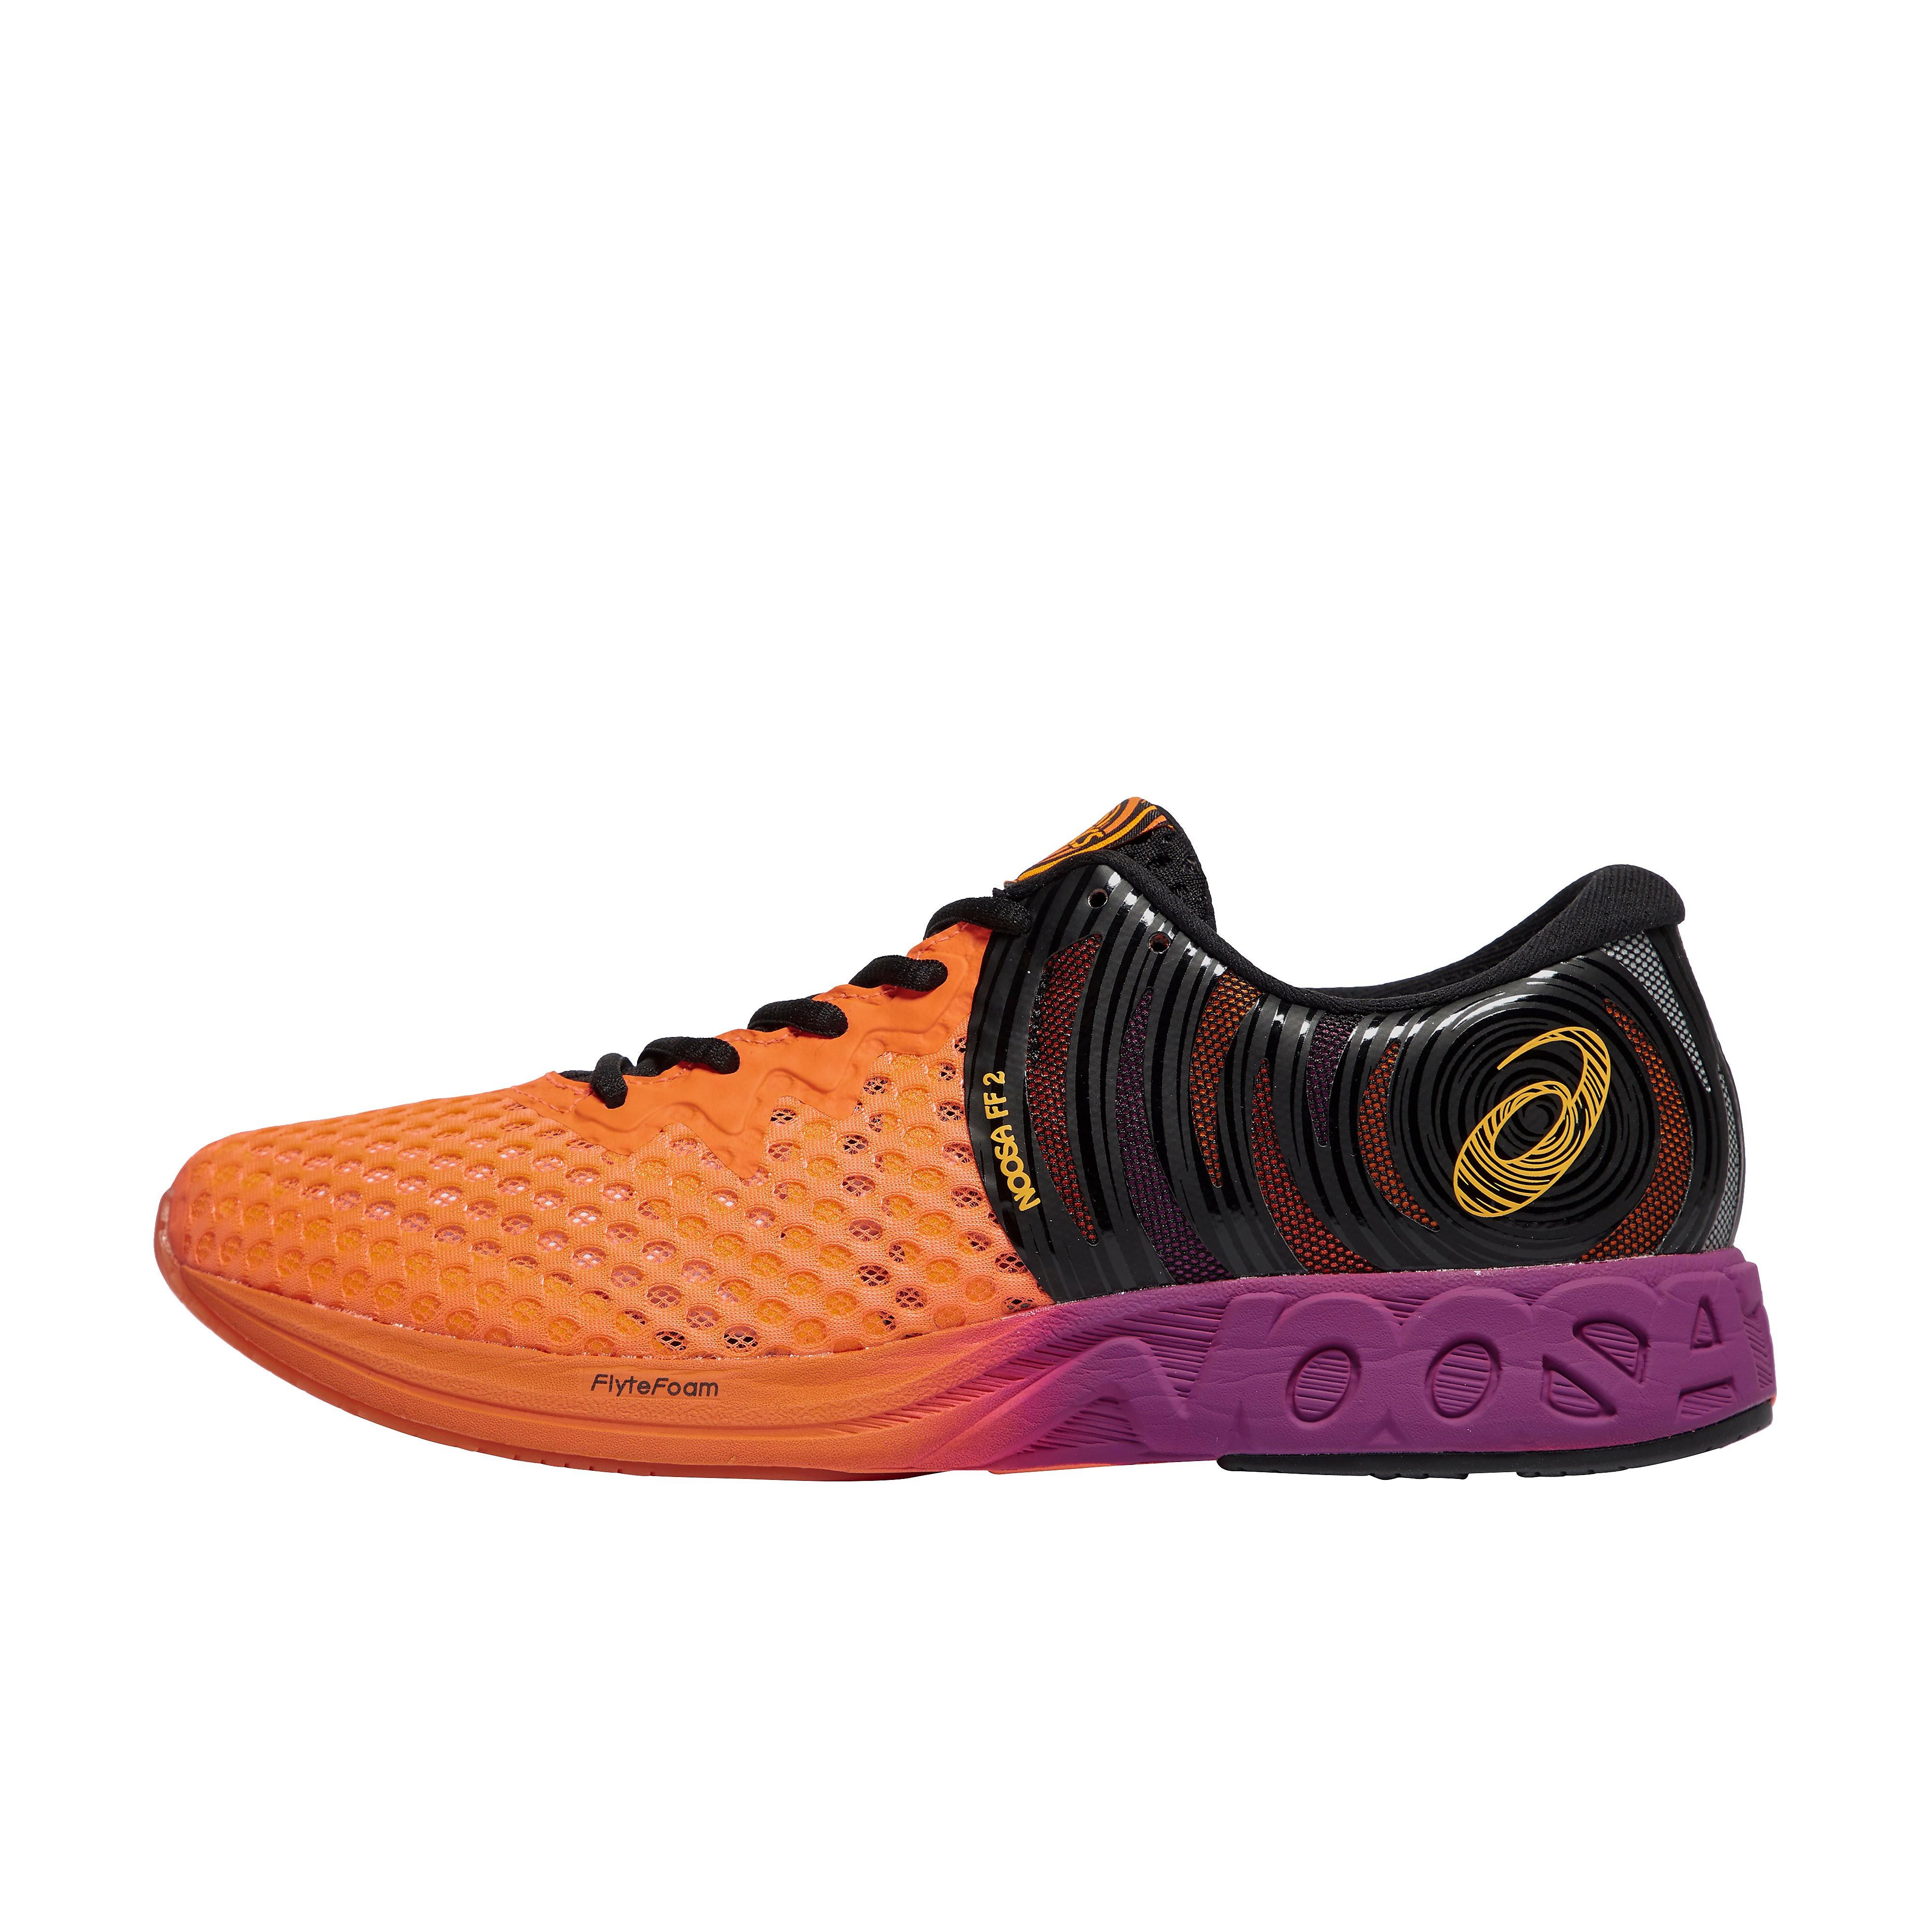 ASICS Noosa flytefoam 2 Men's Running Shoes